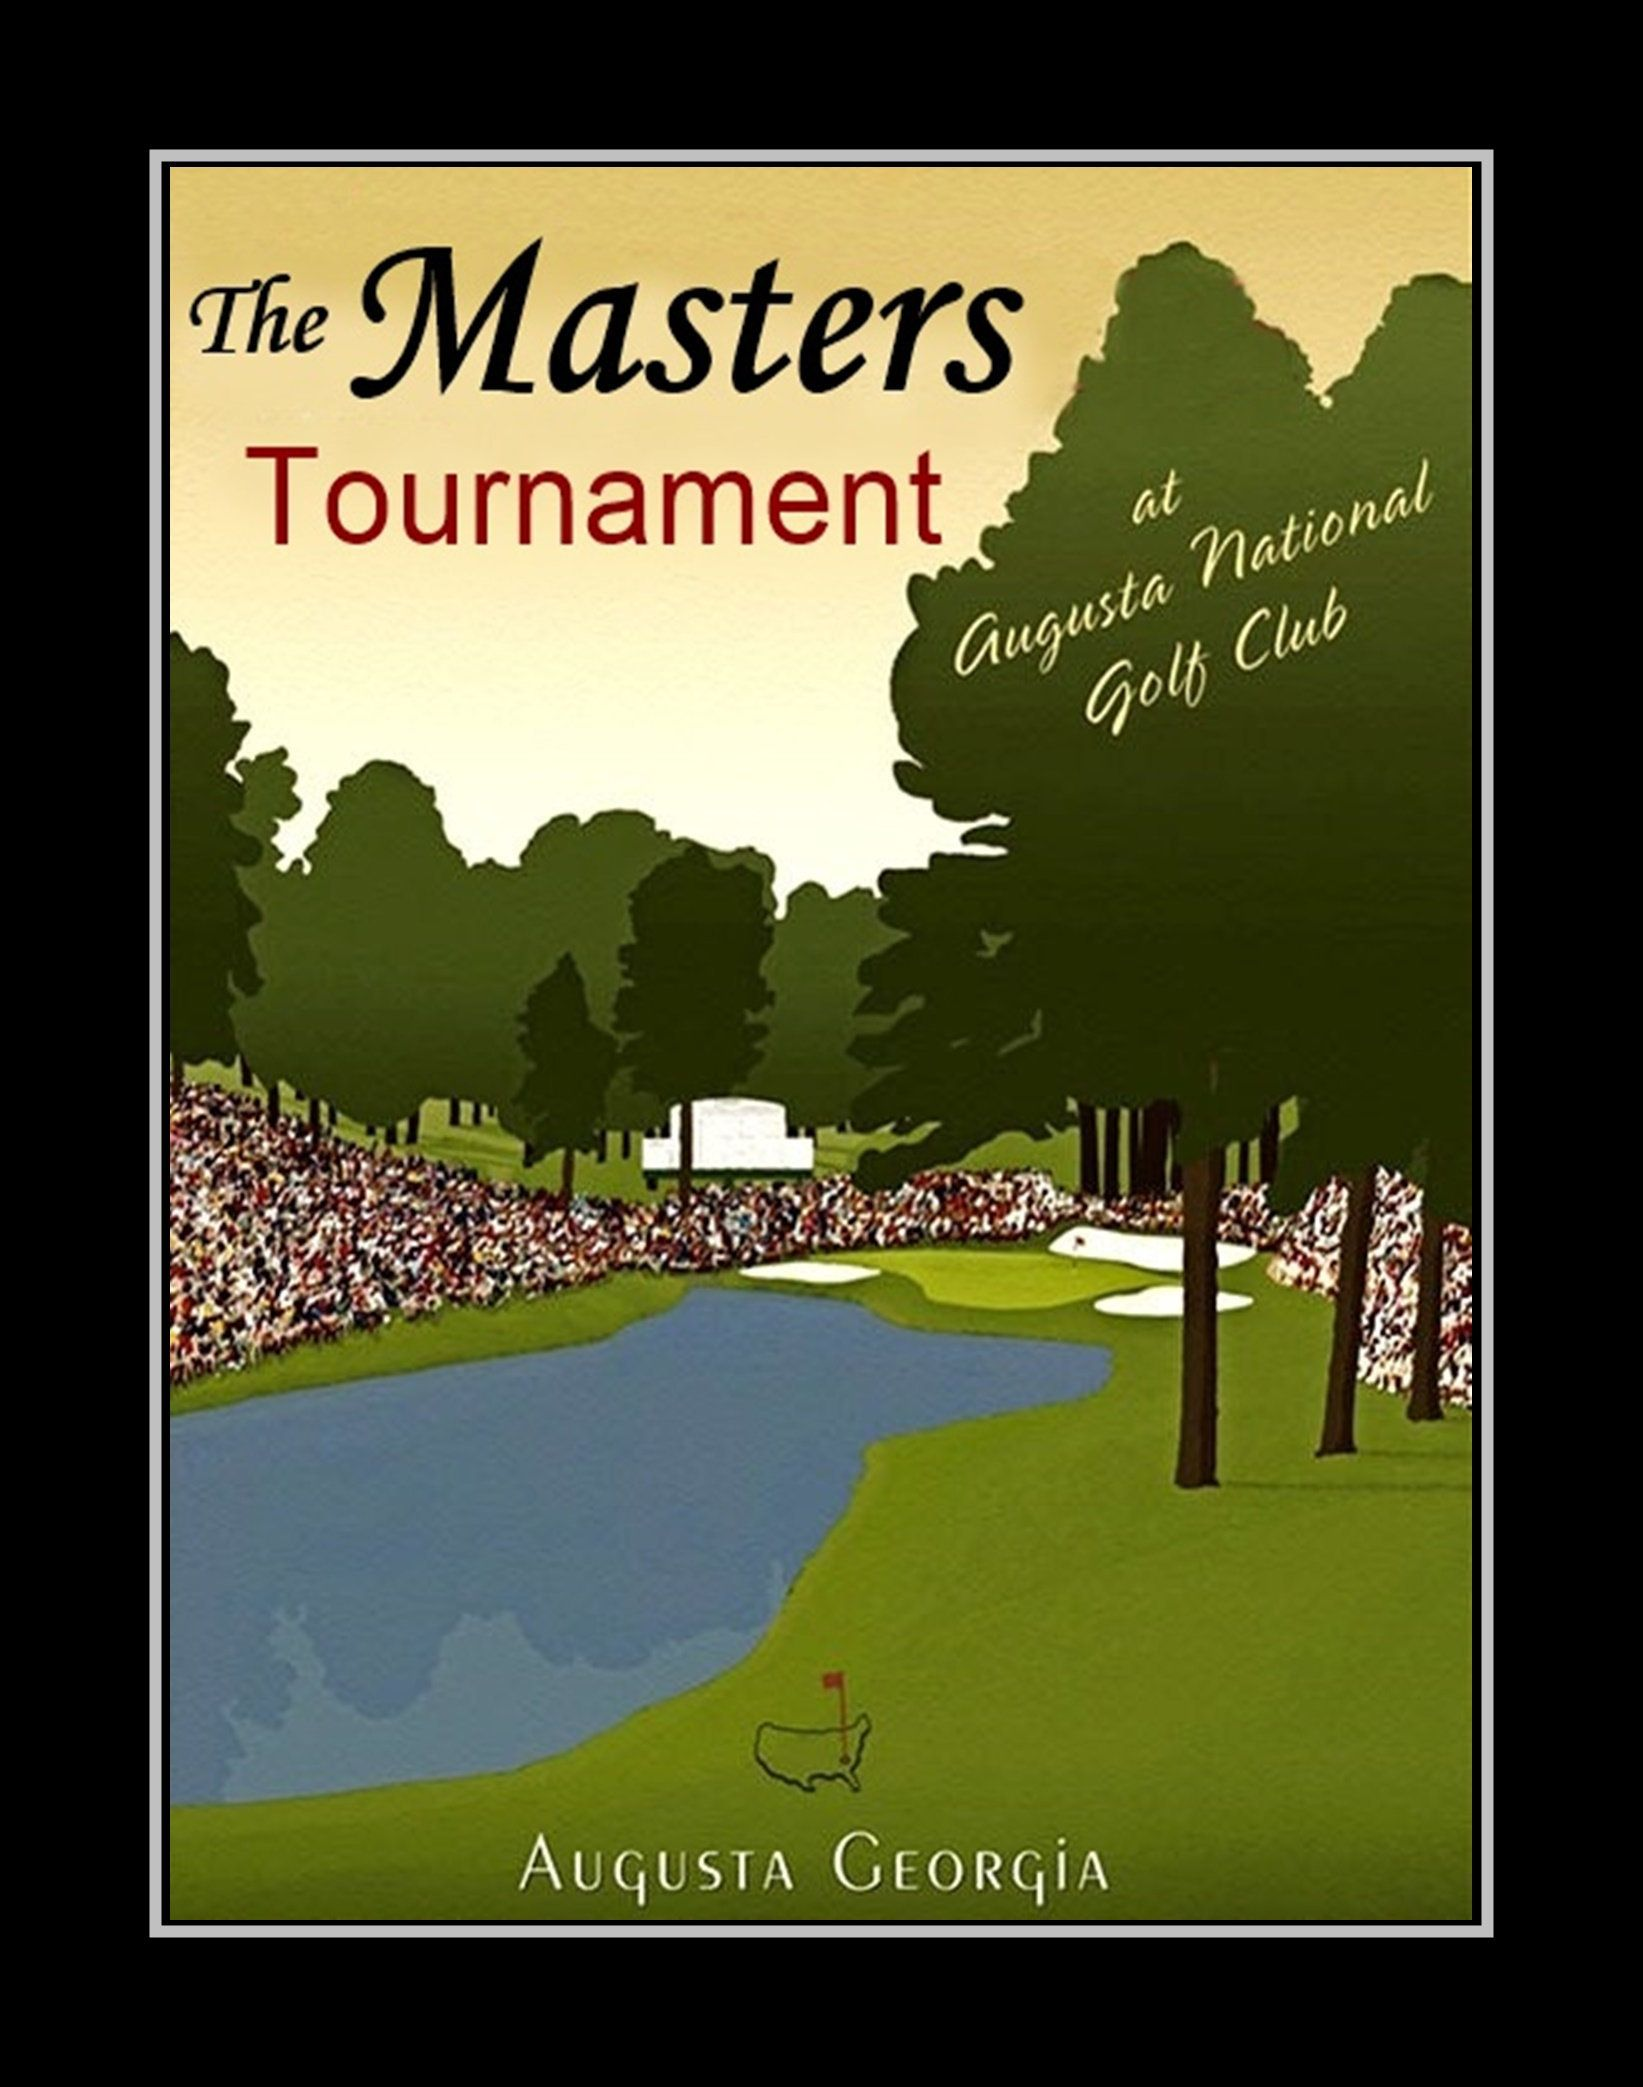 Vintage Masters Golf Poster Illustration Wall Art Gift For Men Office Bathroom Georgia Painting Wall Dec Golf Poster Golf Tips Augusta National Golf Club